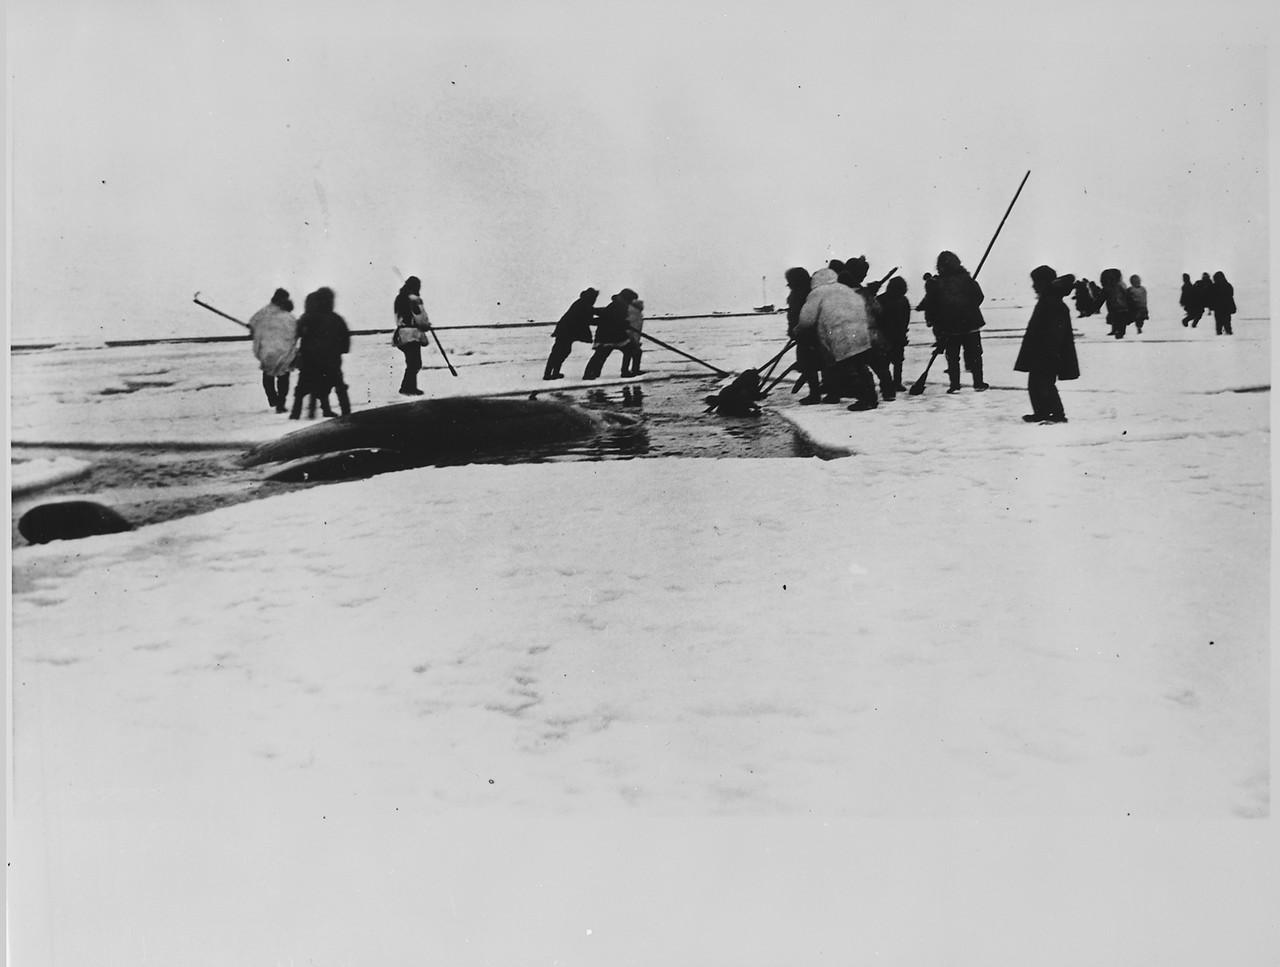 Eskimos_harpooning_a_whale,_Point_Barrow,_Alaska,_1935__-_NARA.jpg